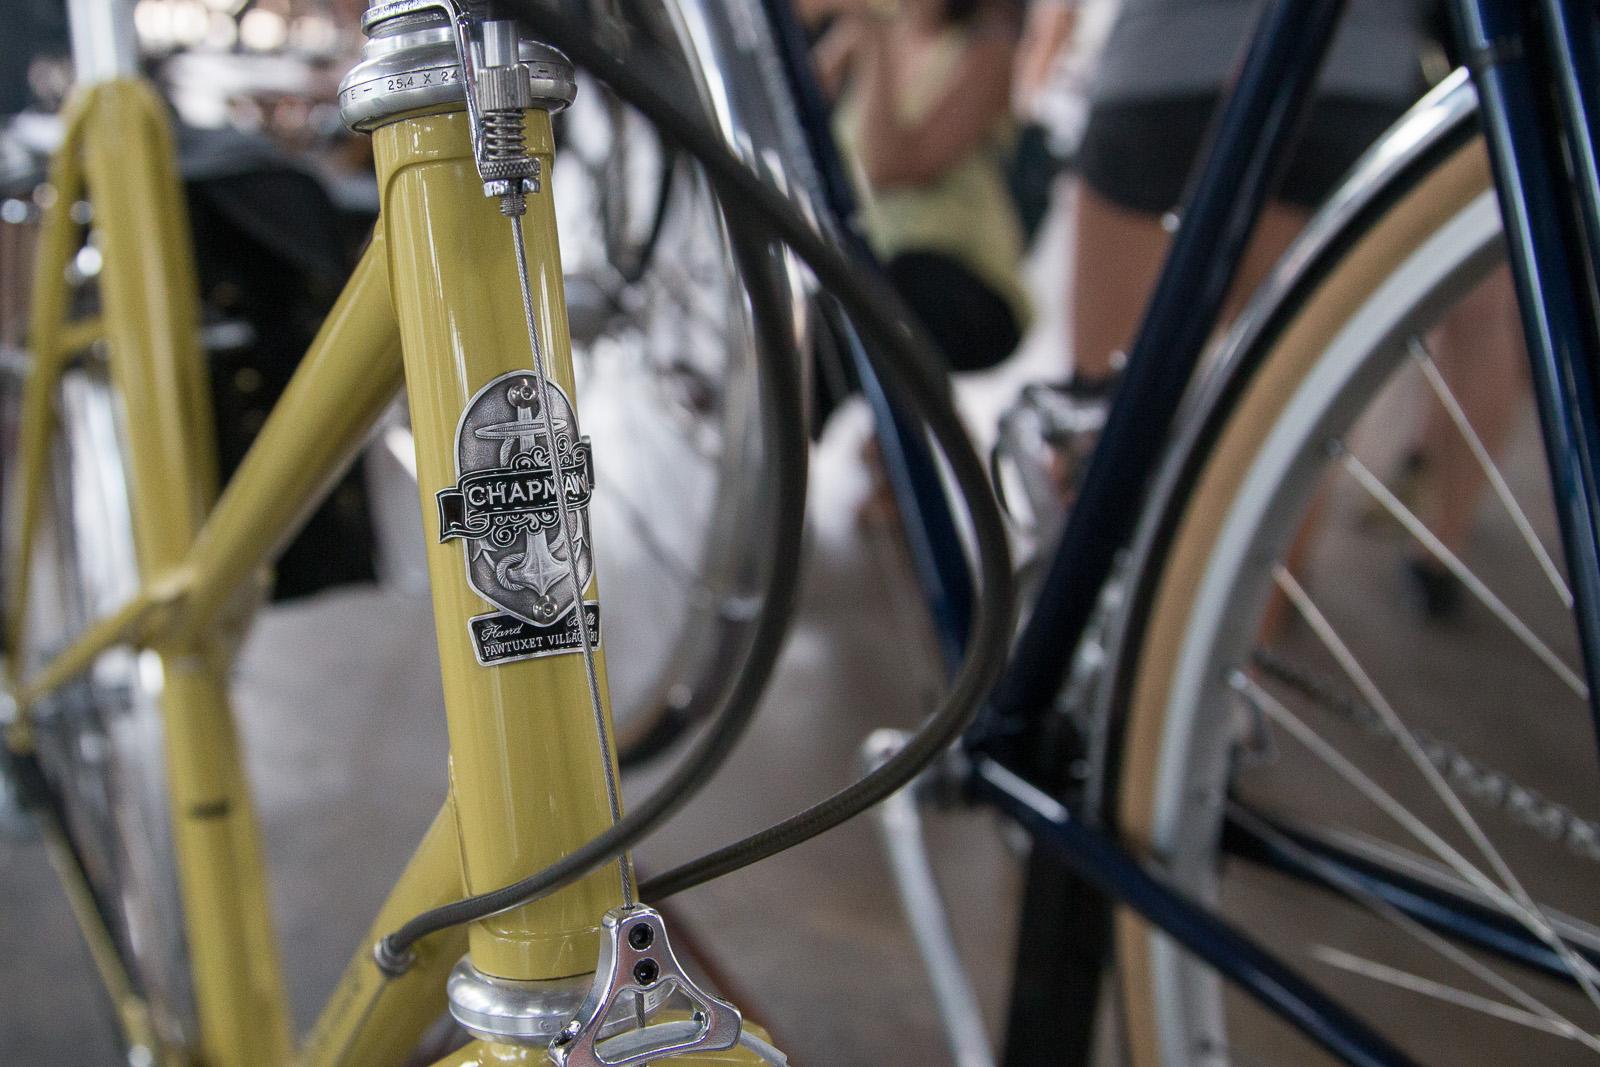 Chapman Cycles.